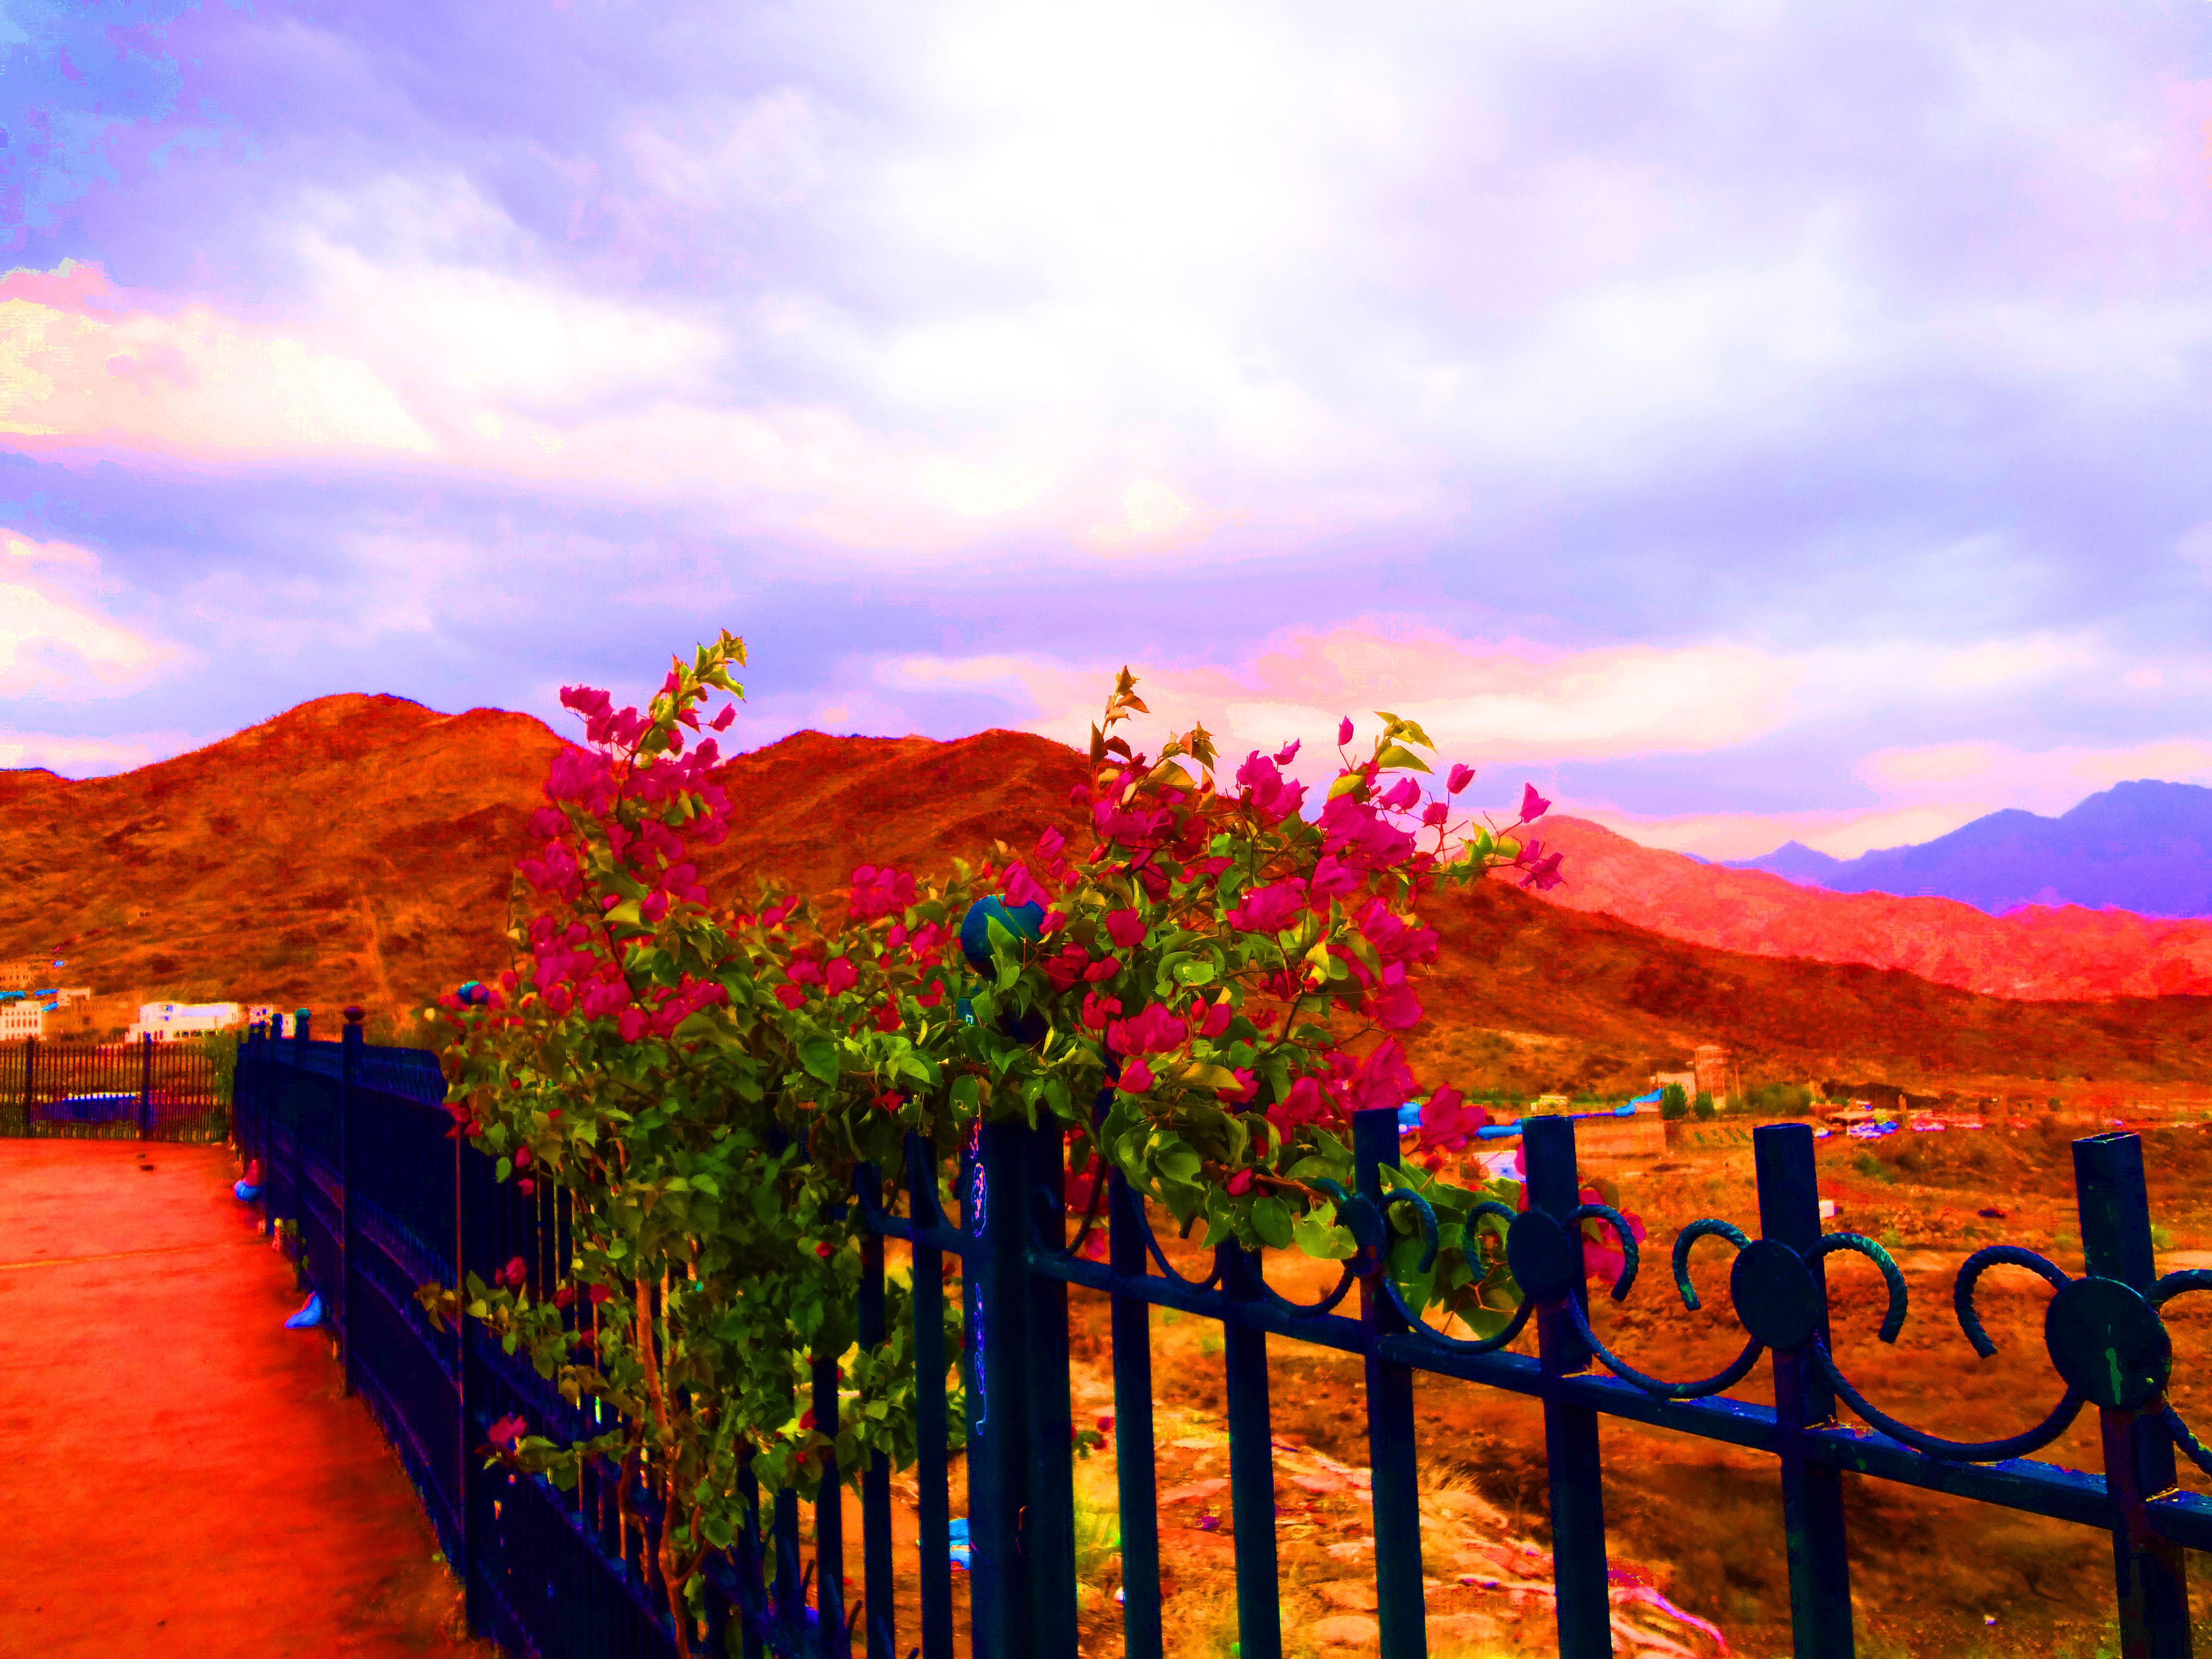 As Sarawat Mountains Al Hada Road Taif Taif Saudi Arabia Natural Landmarks